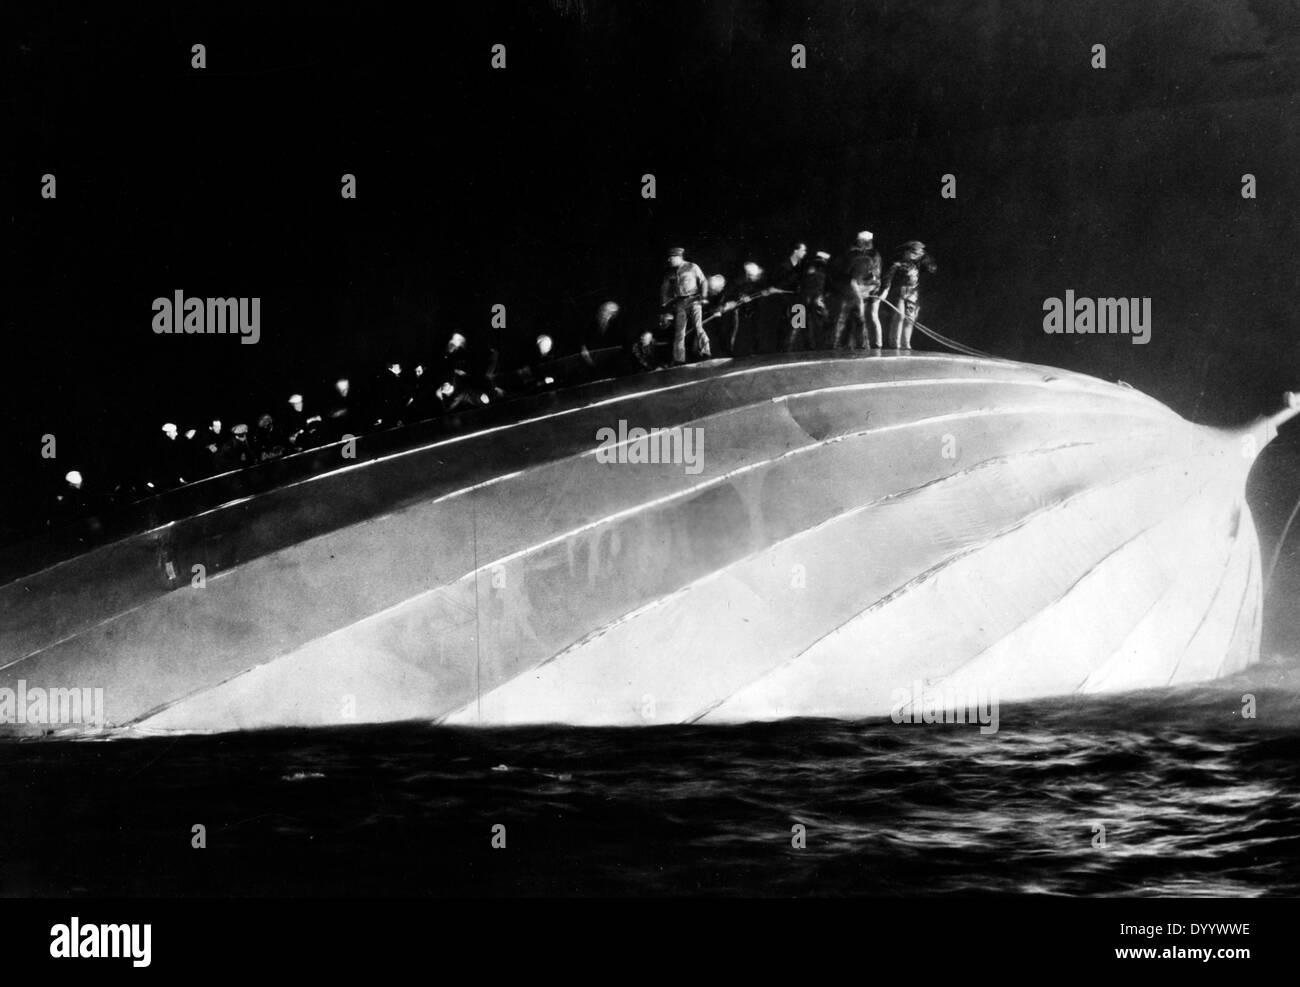 Sinking of airship L 19 - Stock Image